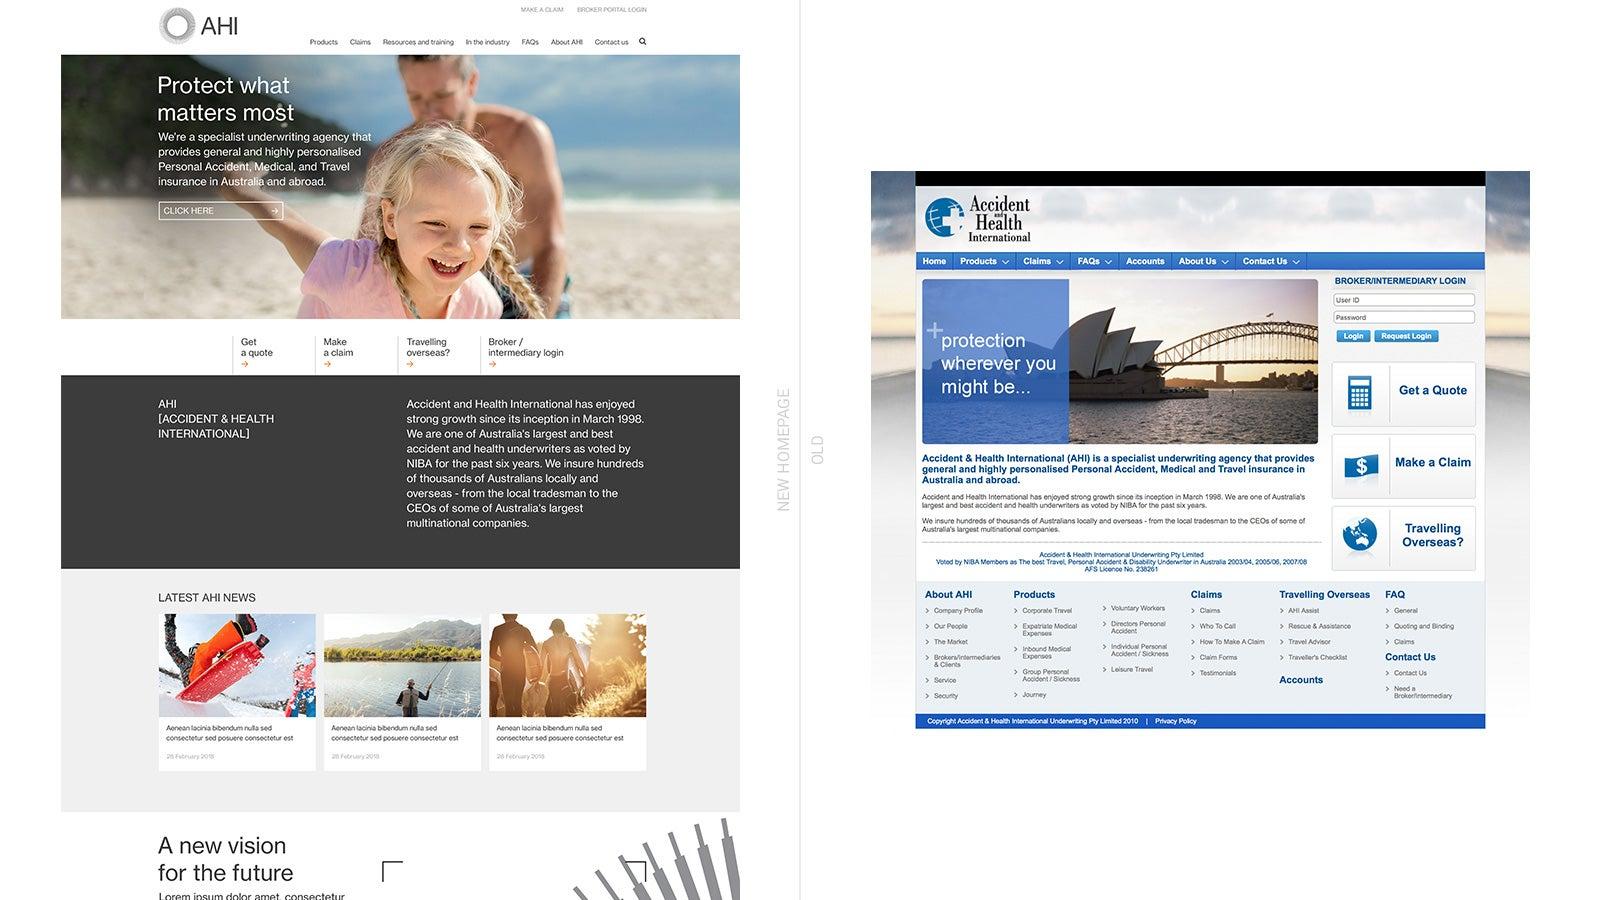 AHI   AHI new website homepage compared to old website homepage   Devotion